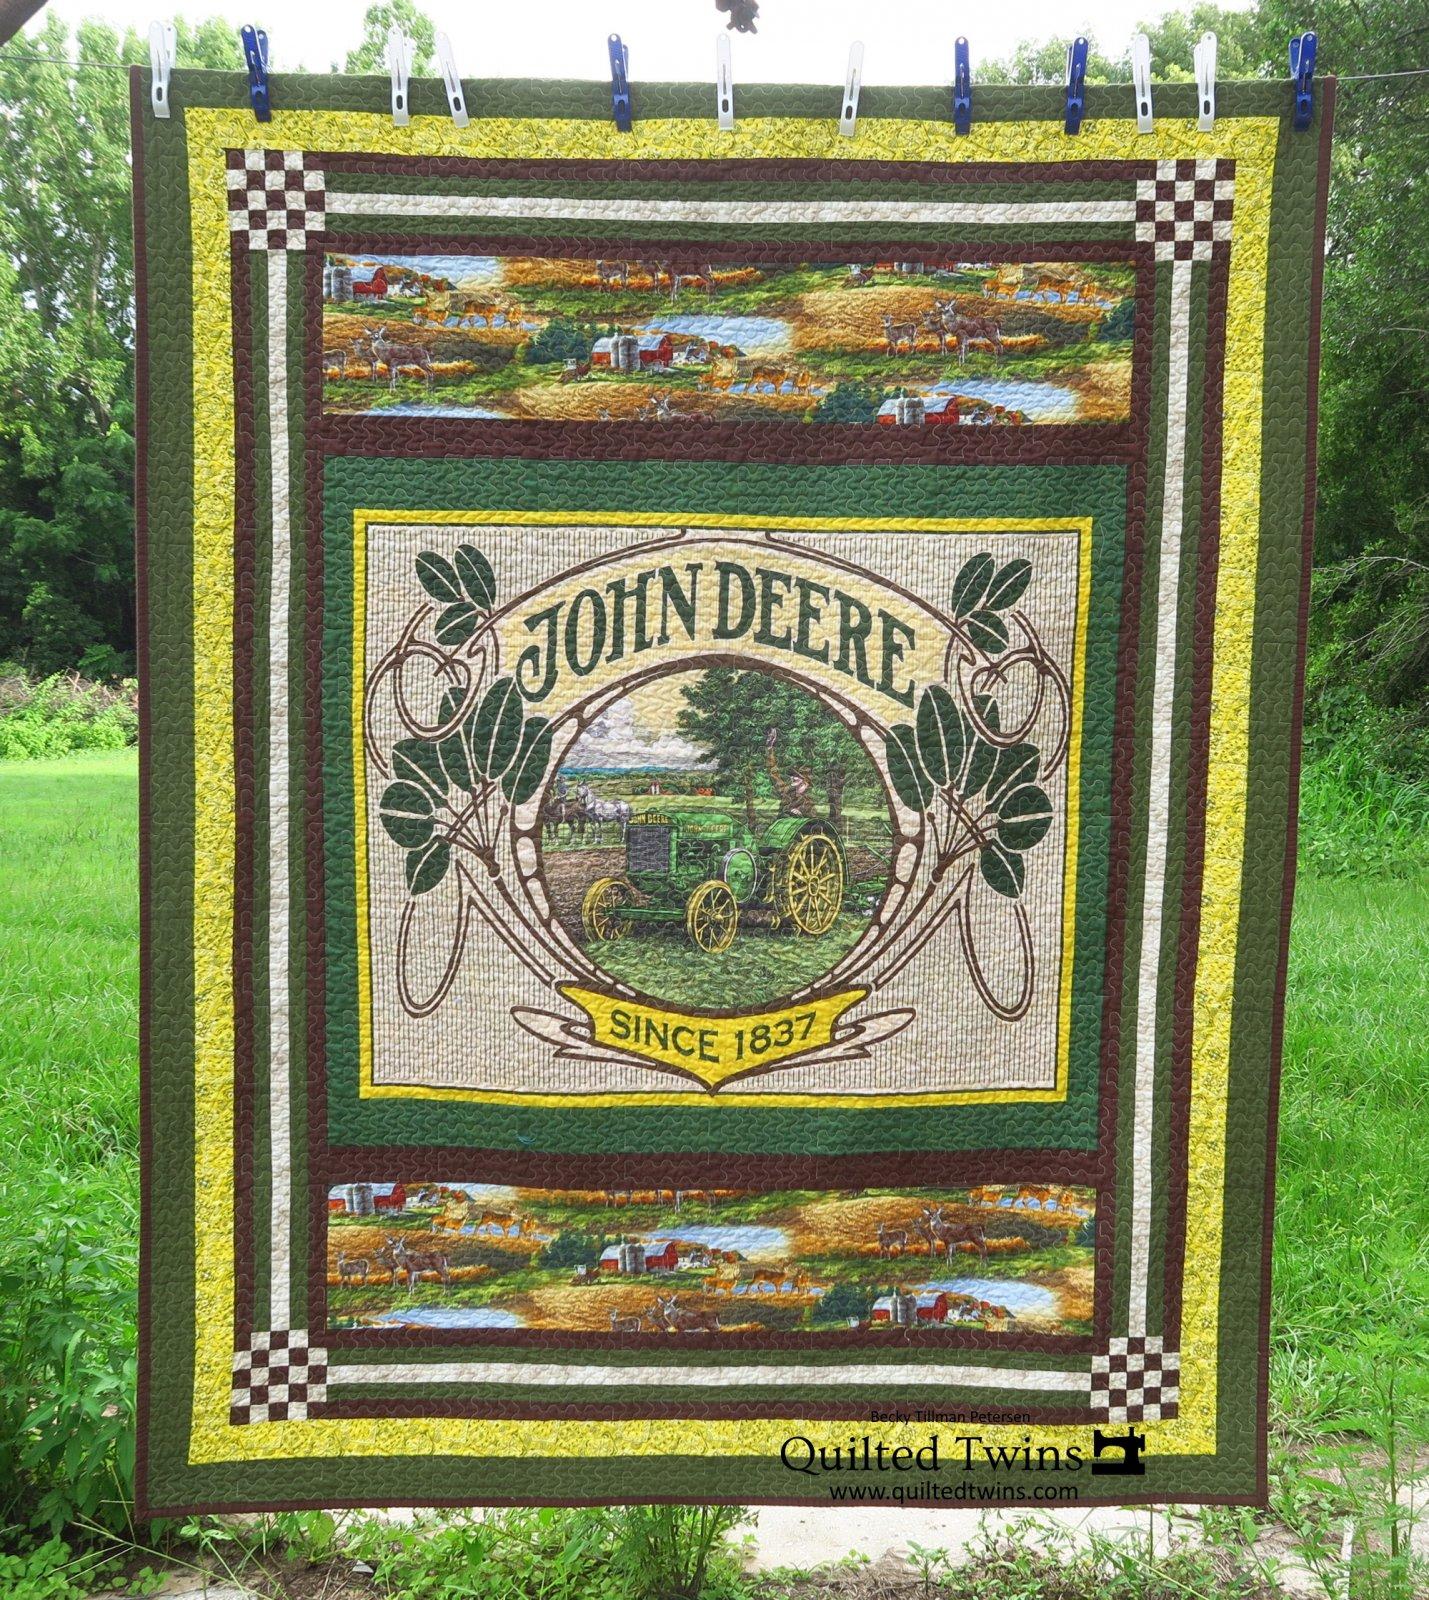 Digital Pattern Download: Down Home - John Deere Vintage Quilt - Digital Pattern by Becky Tillman Petersen